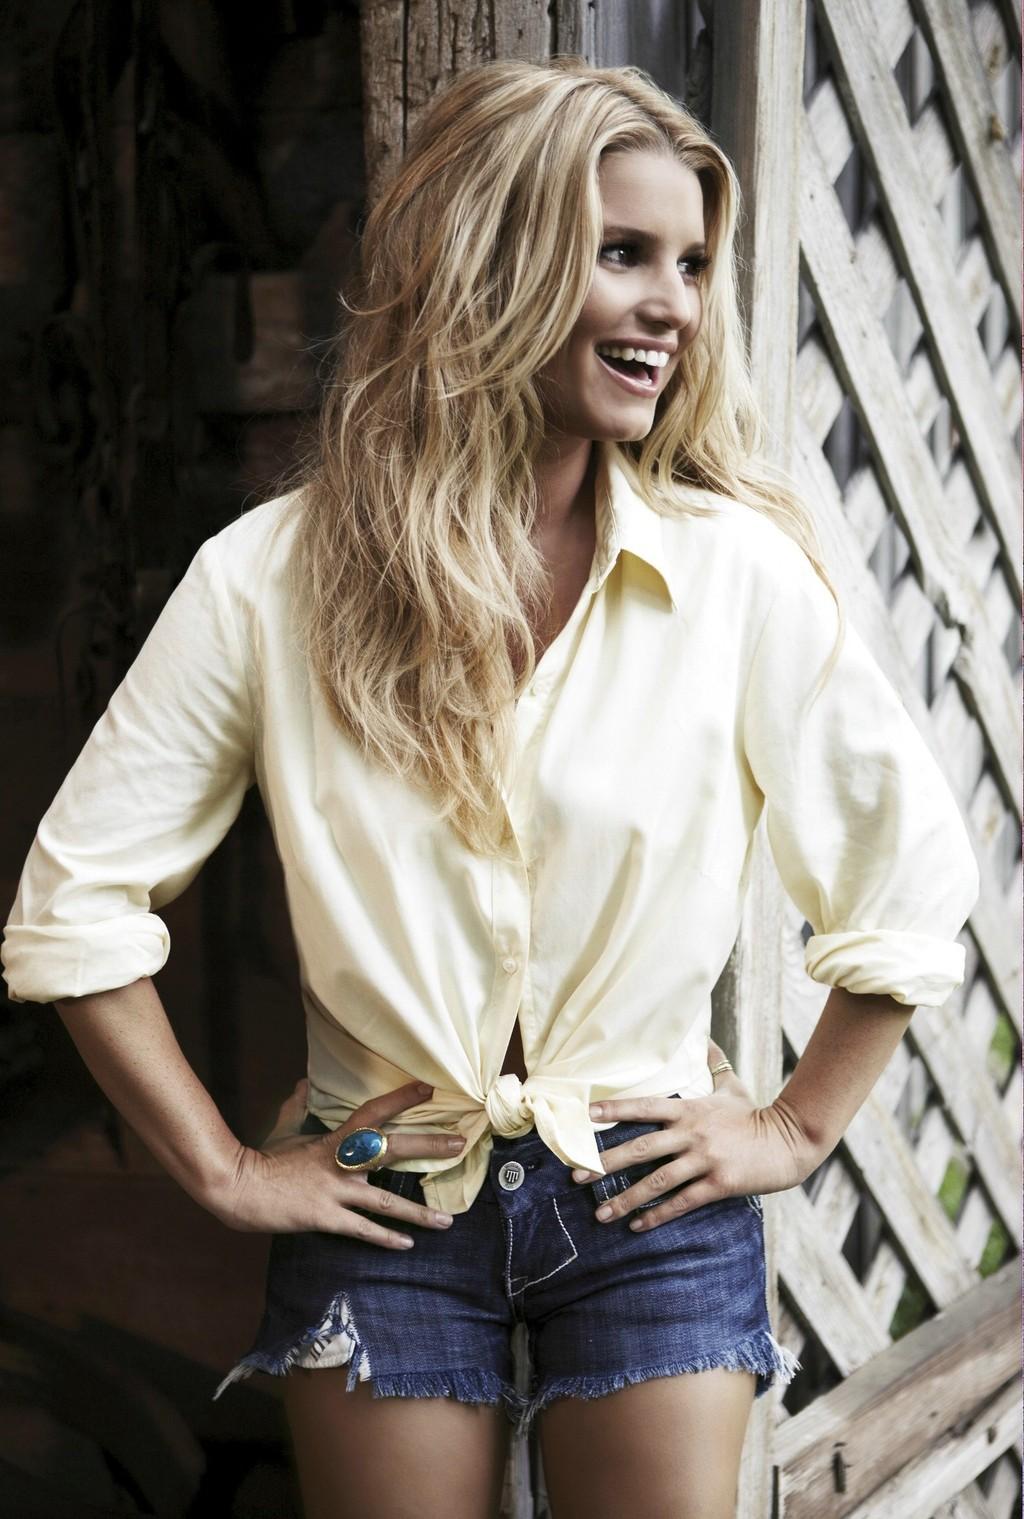 Jessica Simpson in Cutoff Jean Shorts – Jessica Simpson ...